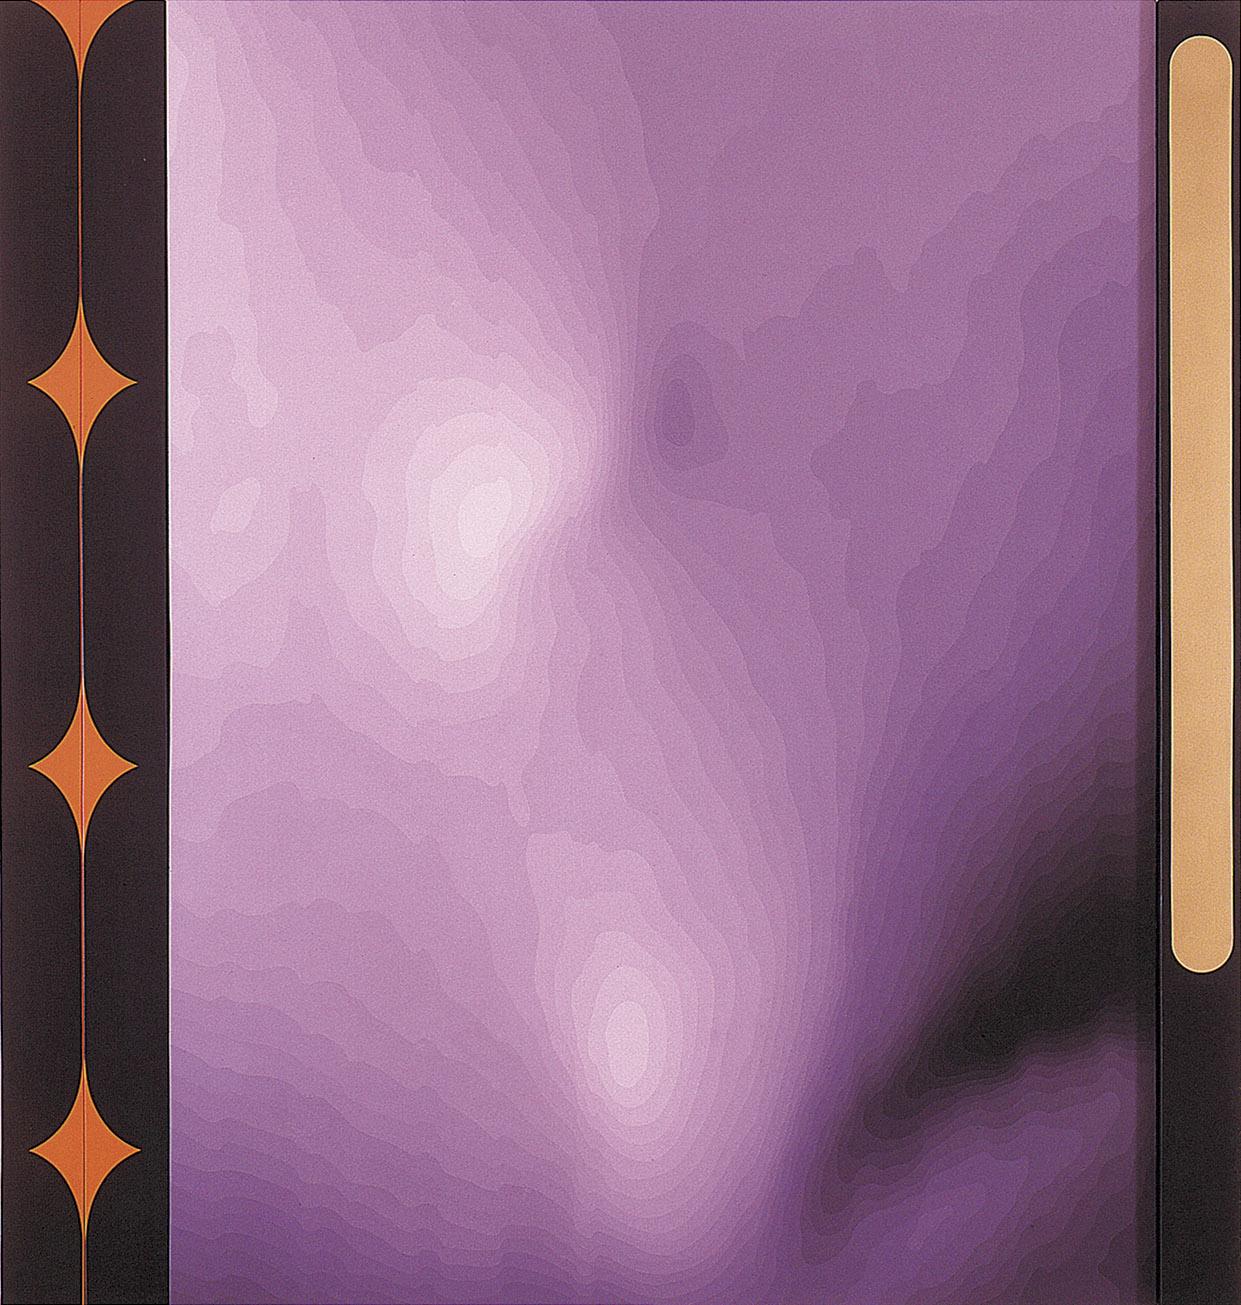 o. T. |1990 | Acryl auf Leinwand | 245 x 230 x 15,5 cm